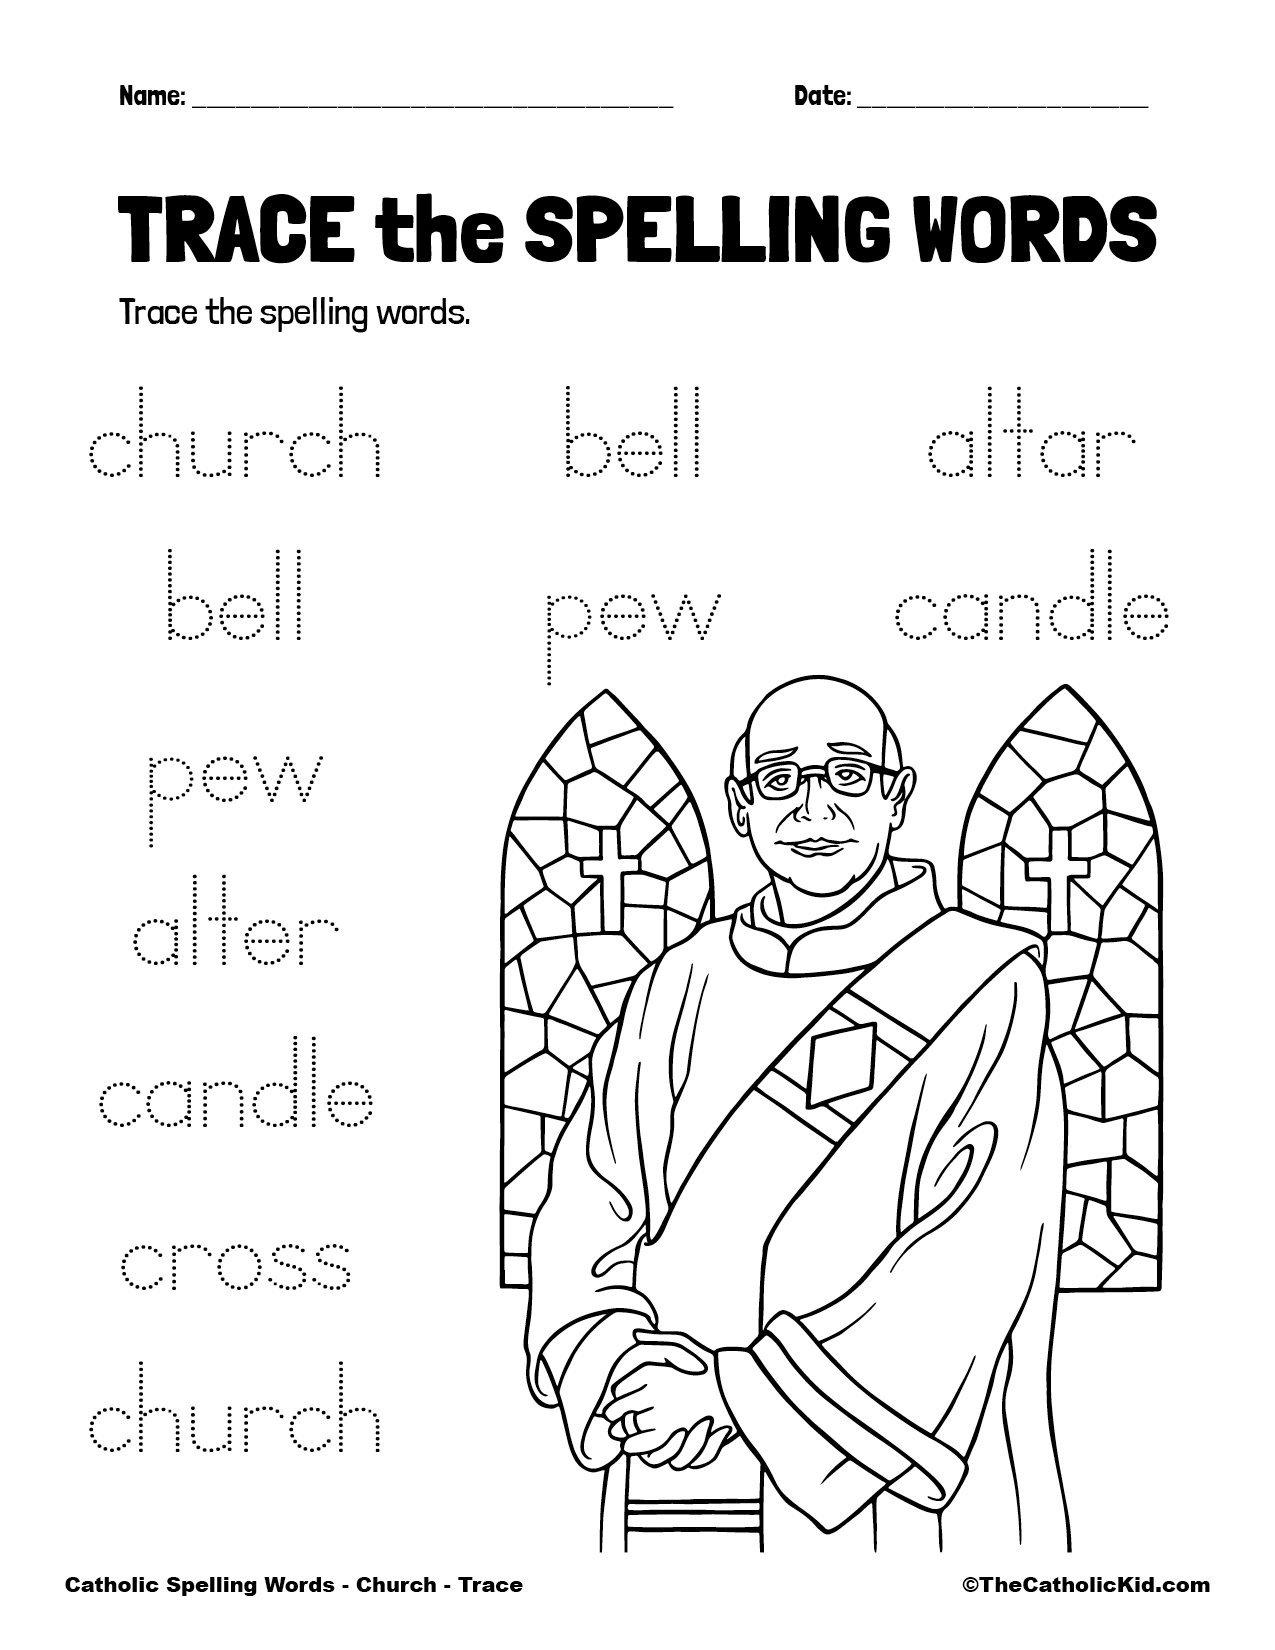 Catholic Spelling & Vocabulary Words Church Worksheet 2 Trace